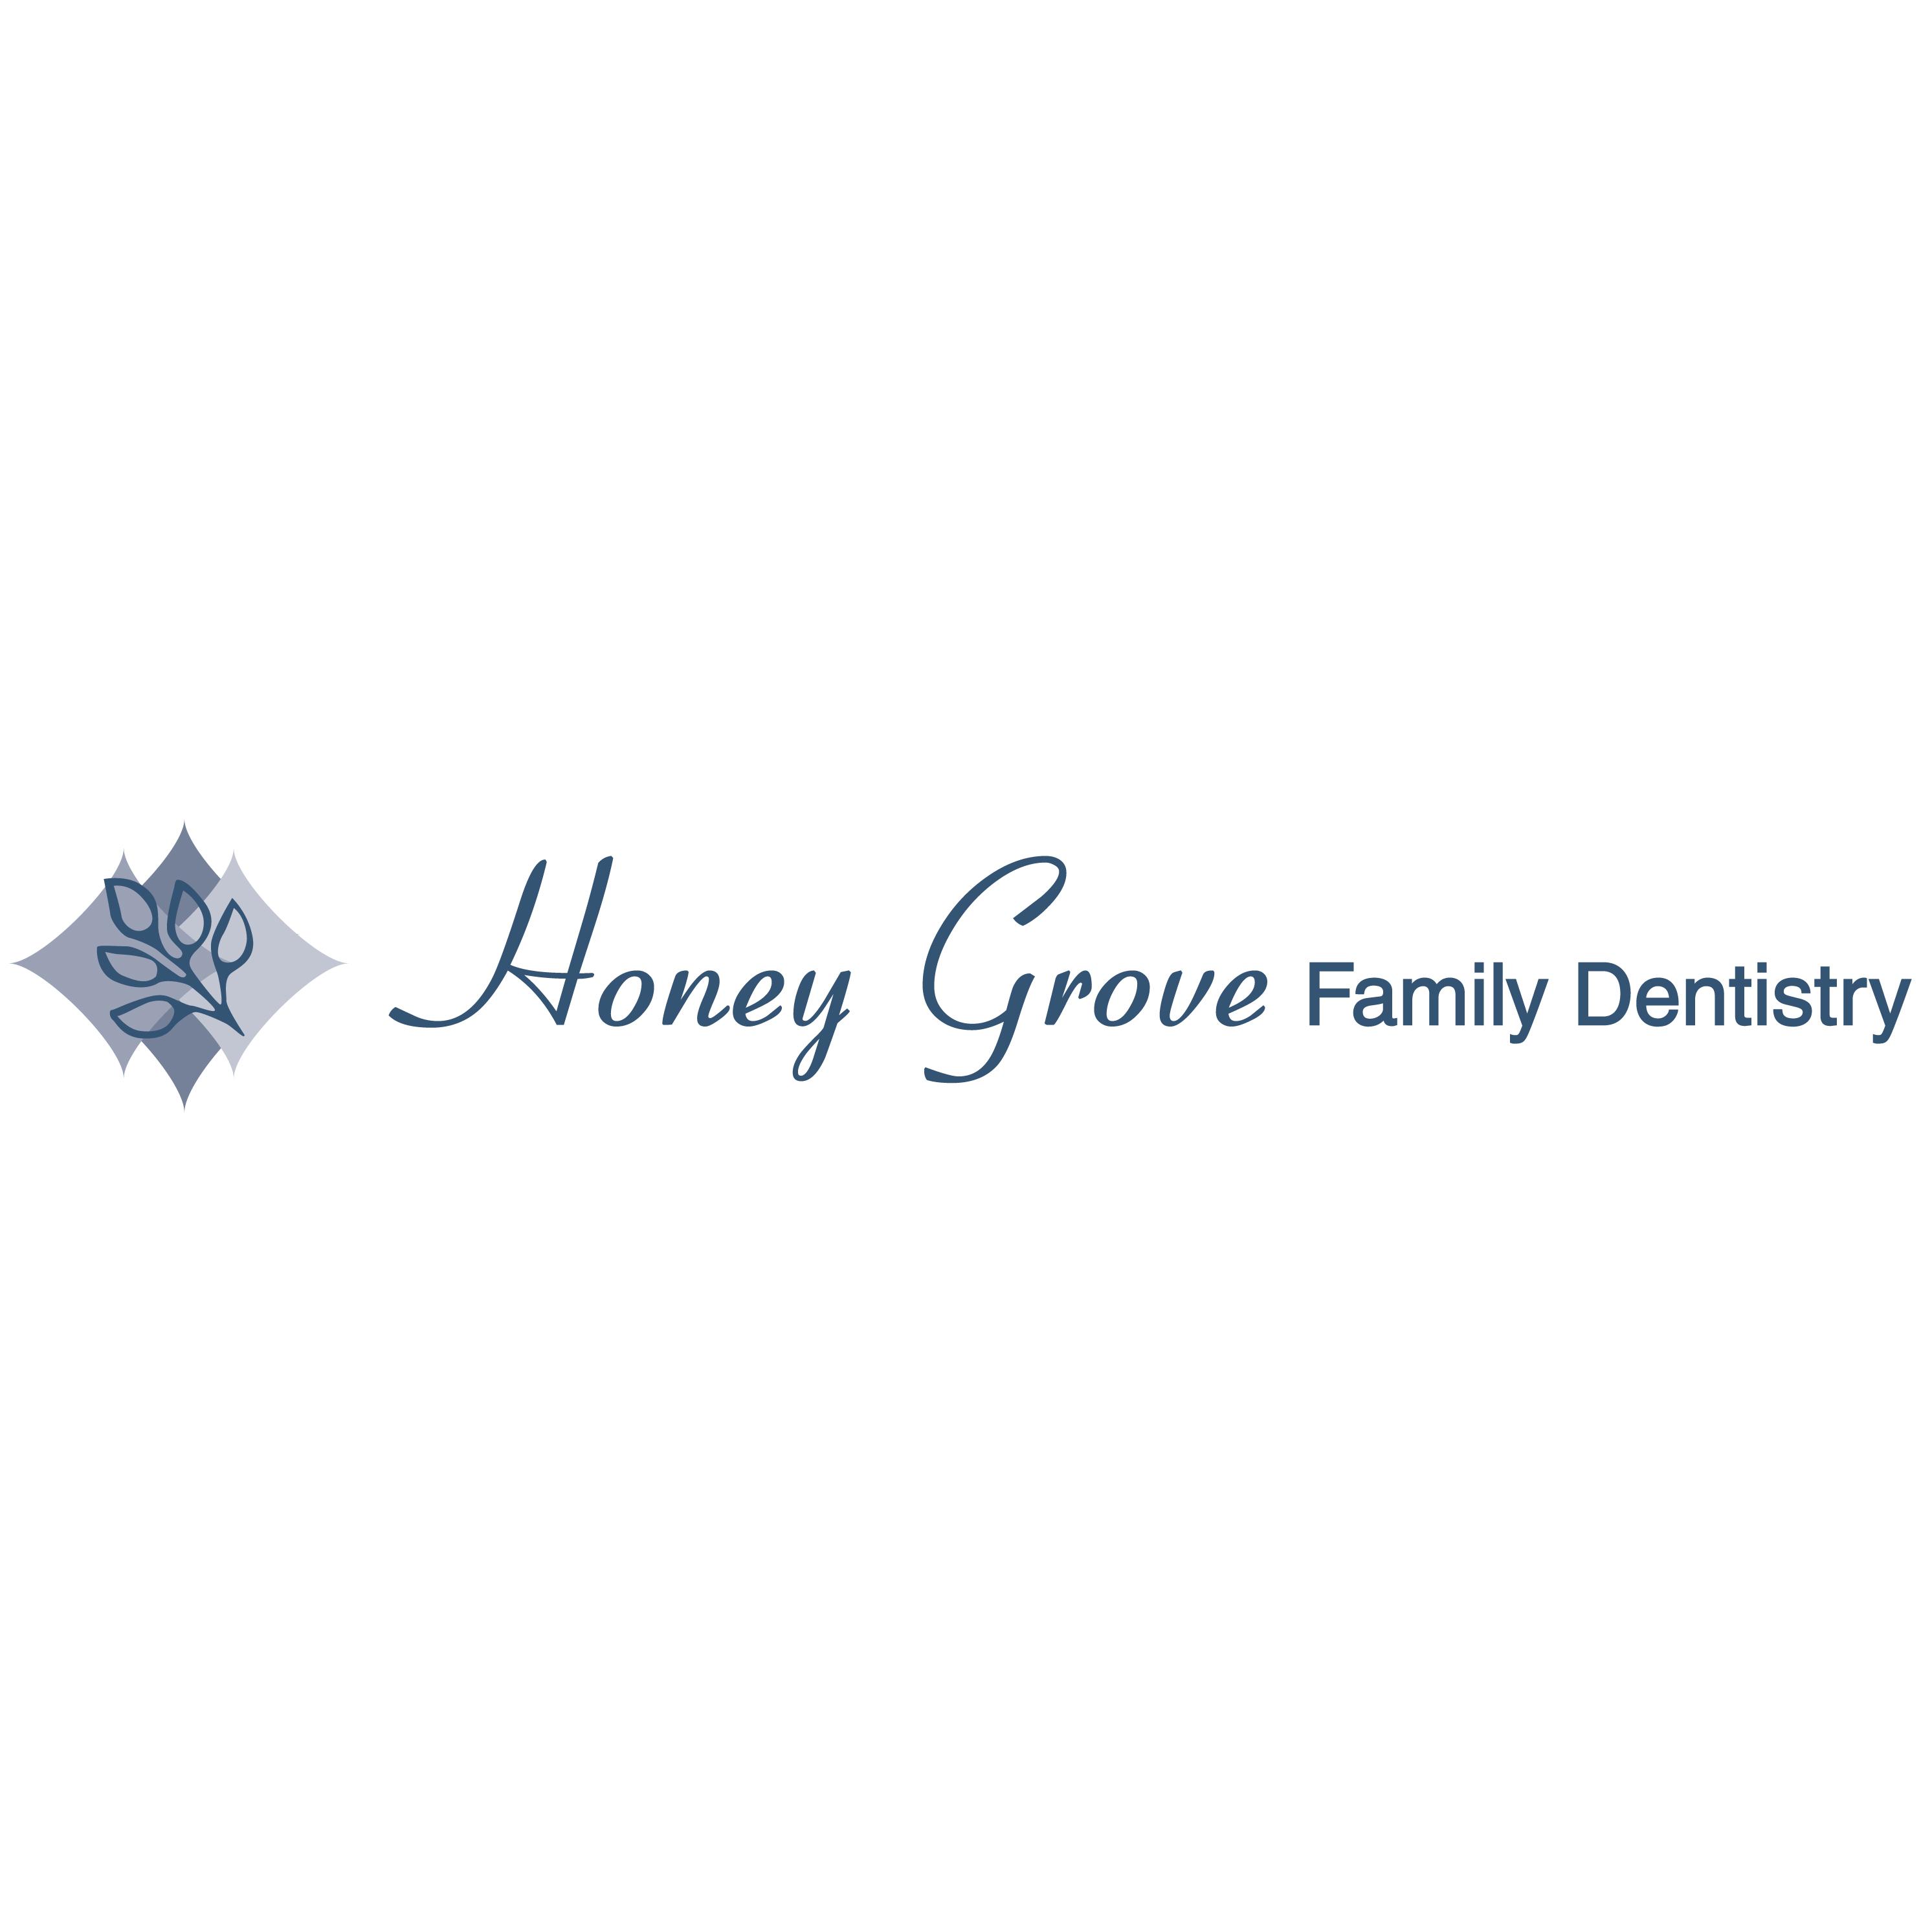 Honey Grove Family Dentistry